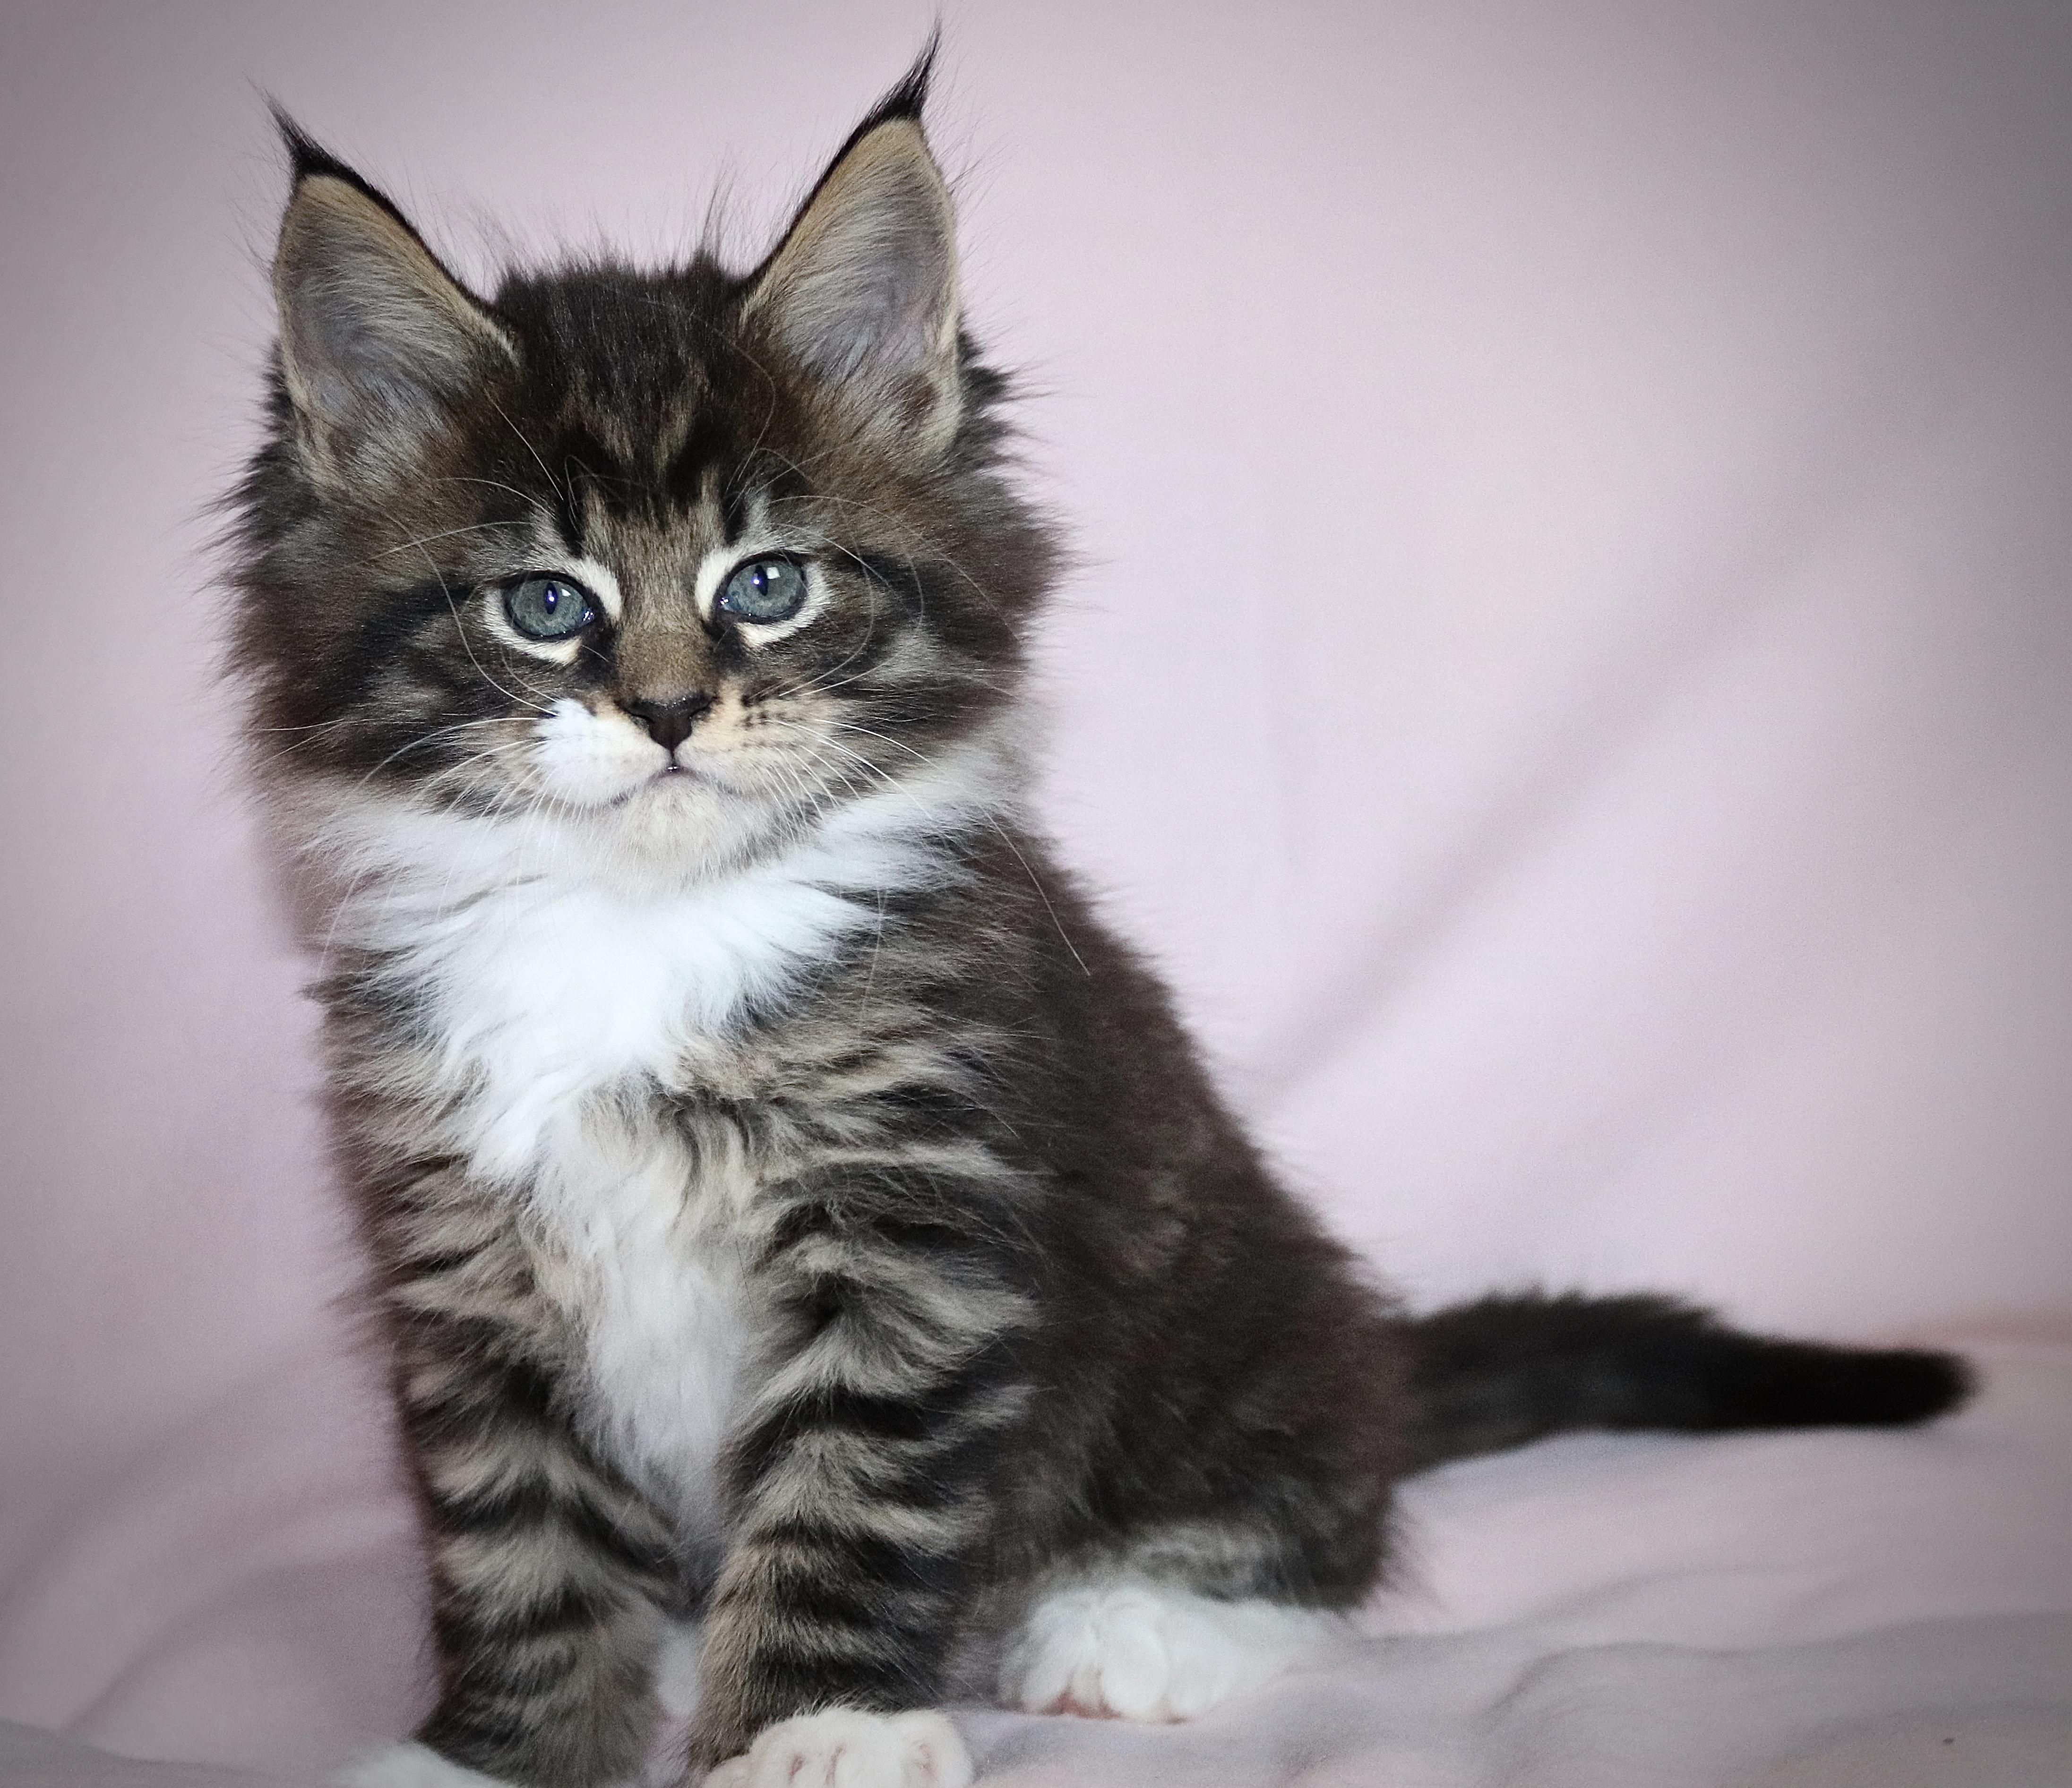 fotka kočky VRH H: HEIDI von ERILLIAN*CZ 👧🏼